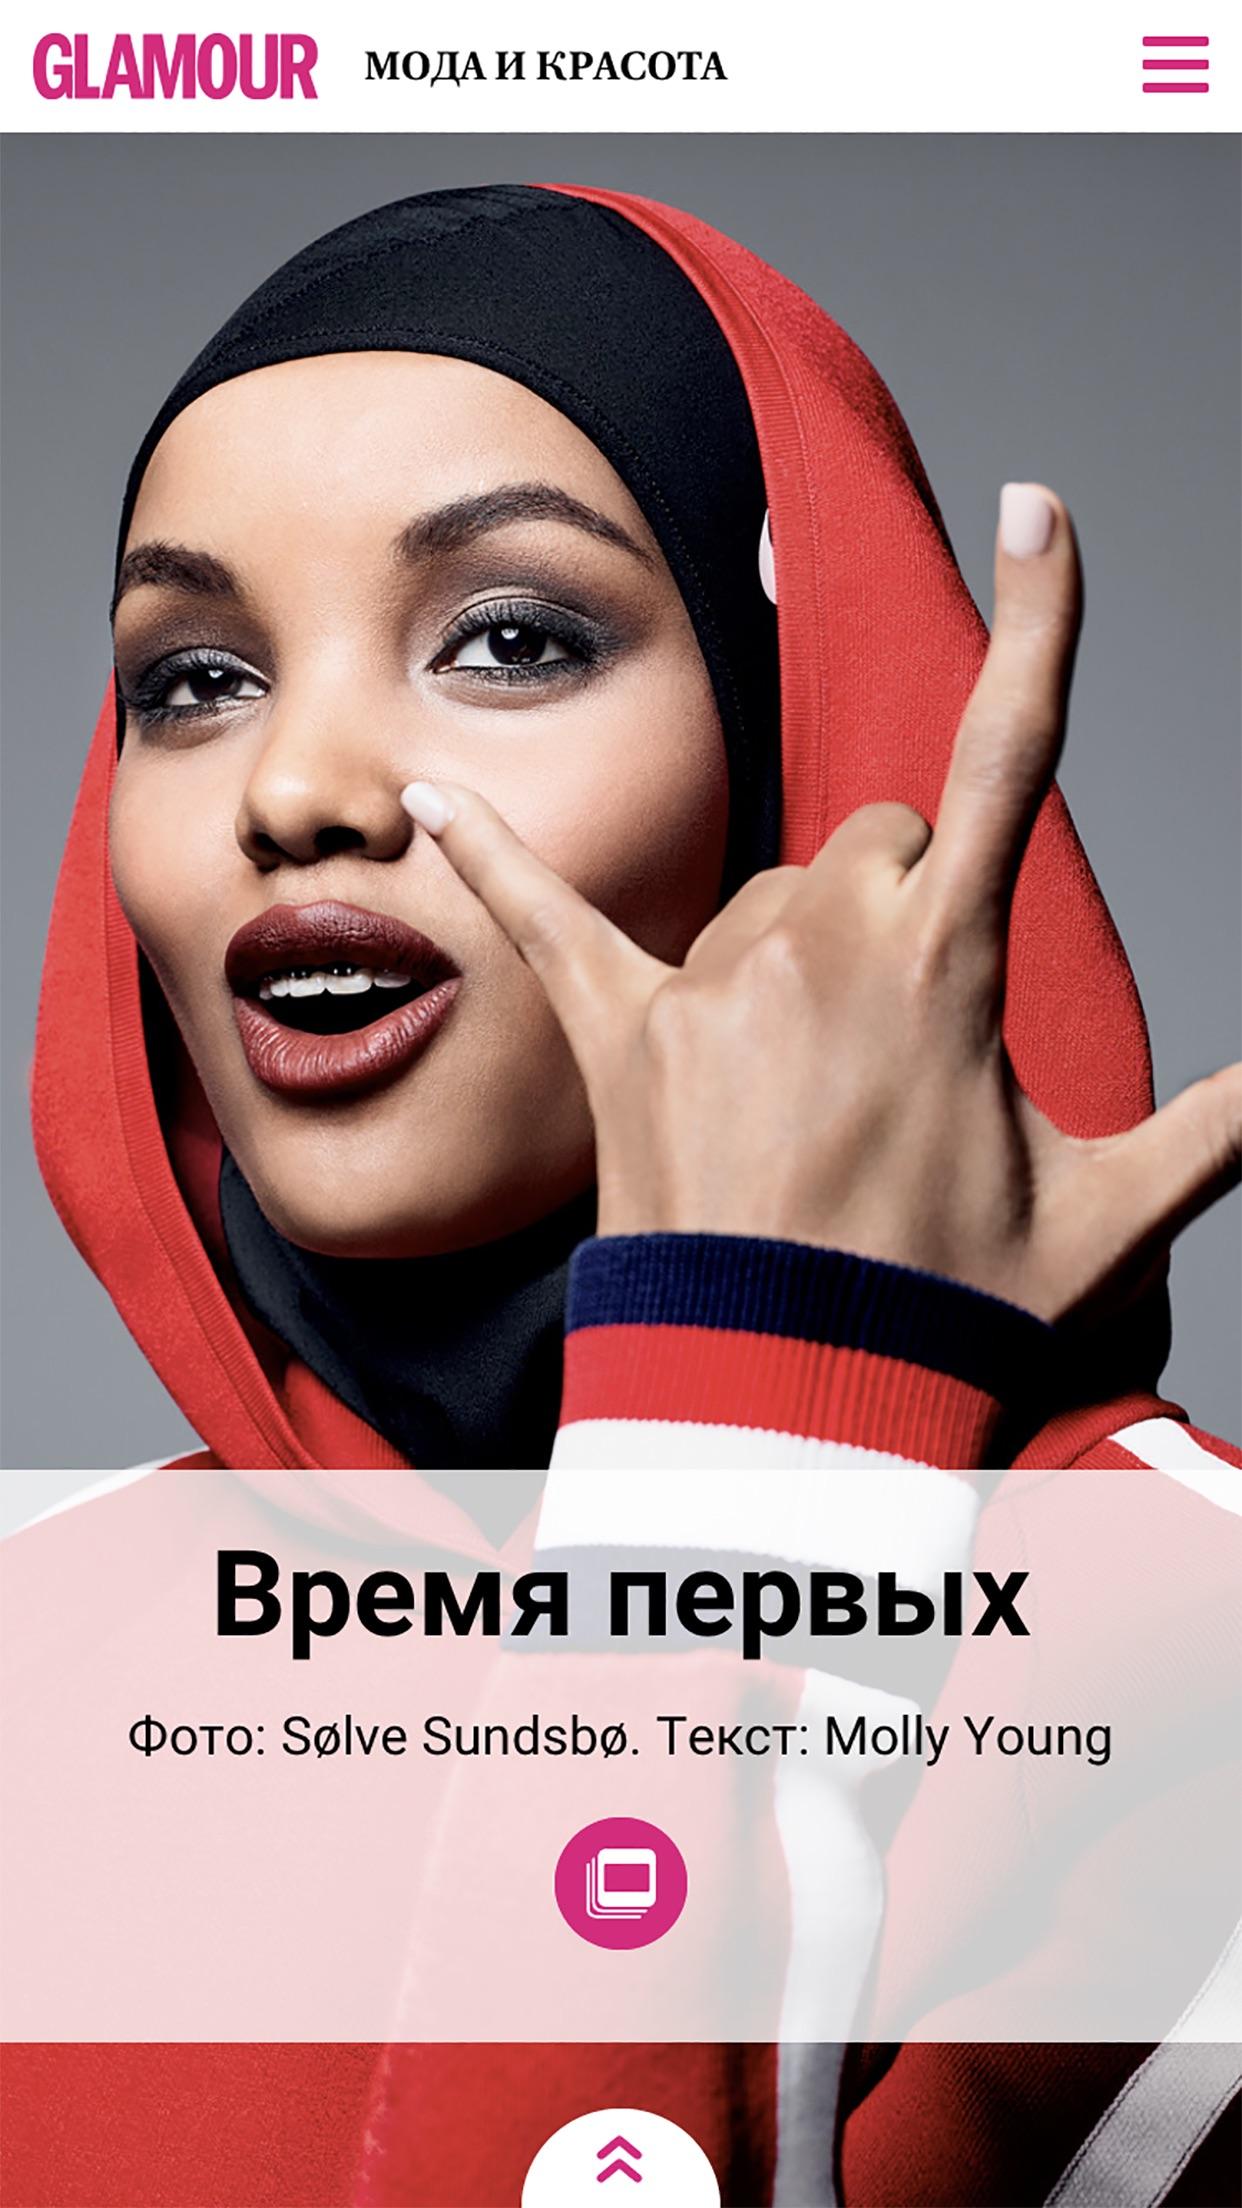 Glamour Russia Screenshot